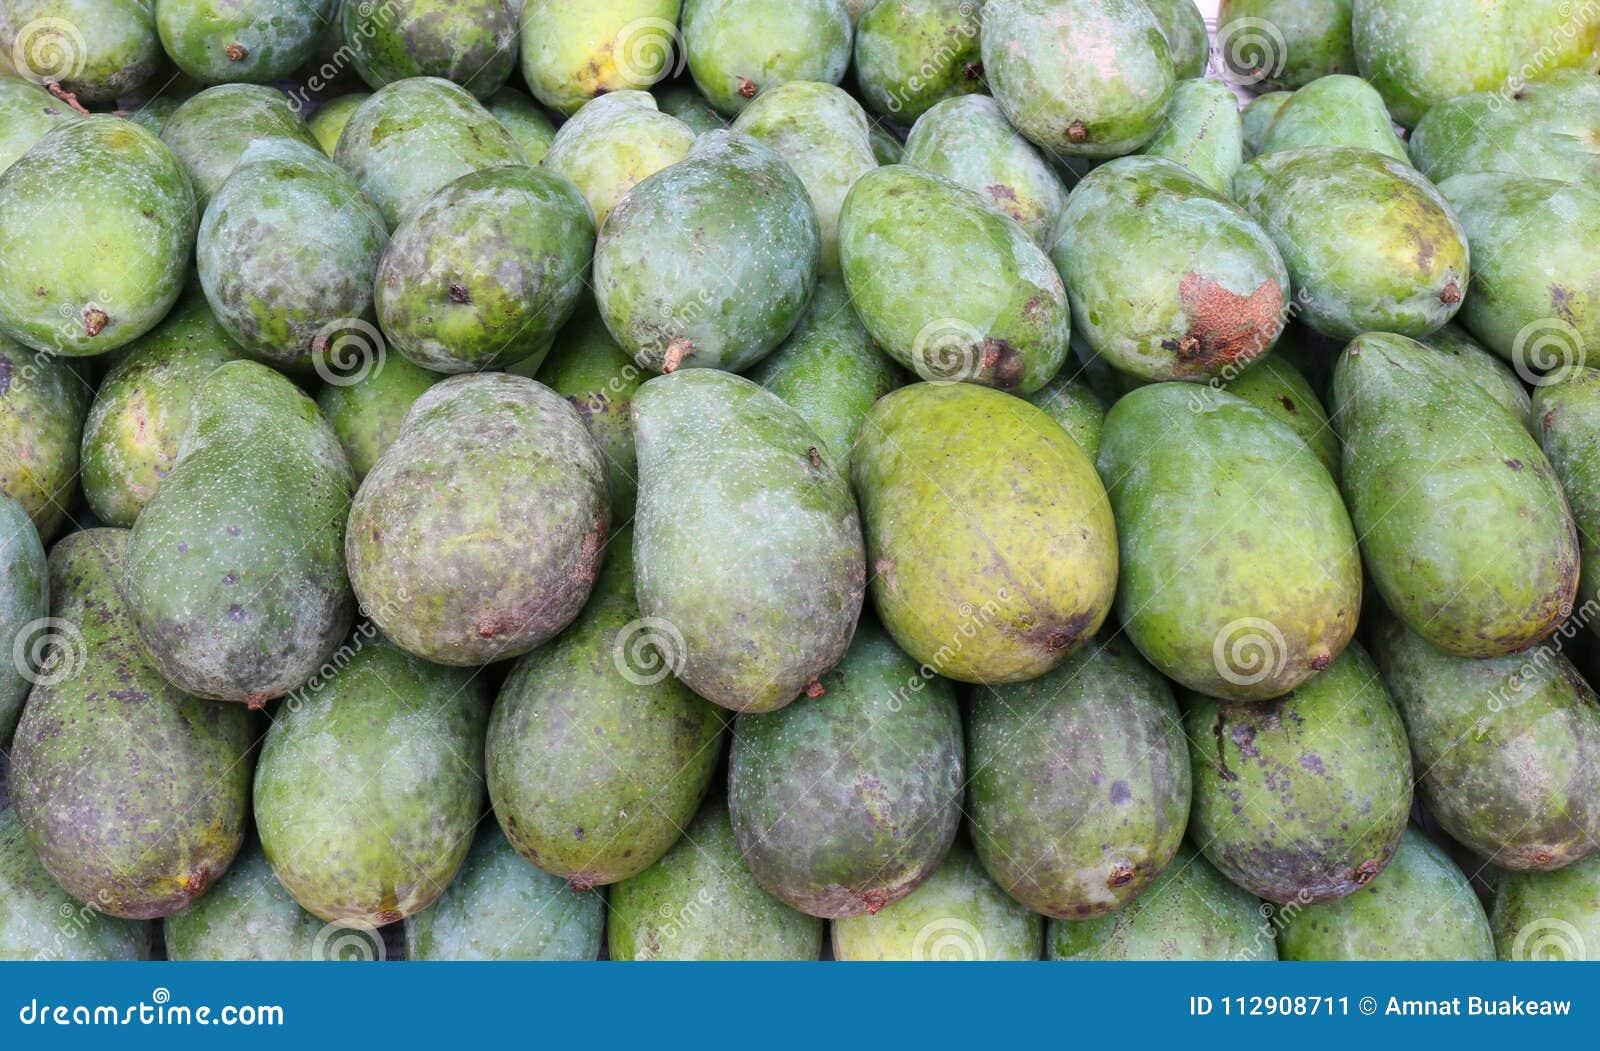 Raw Mango Pictures